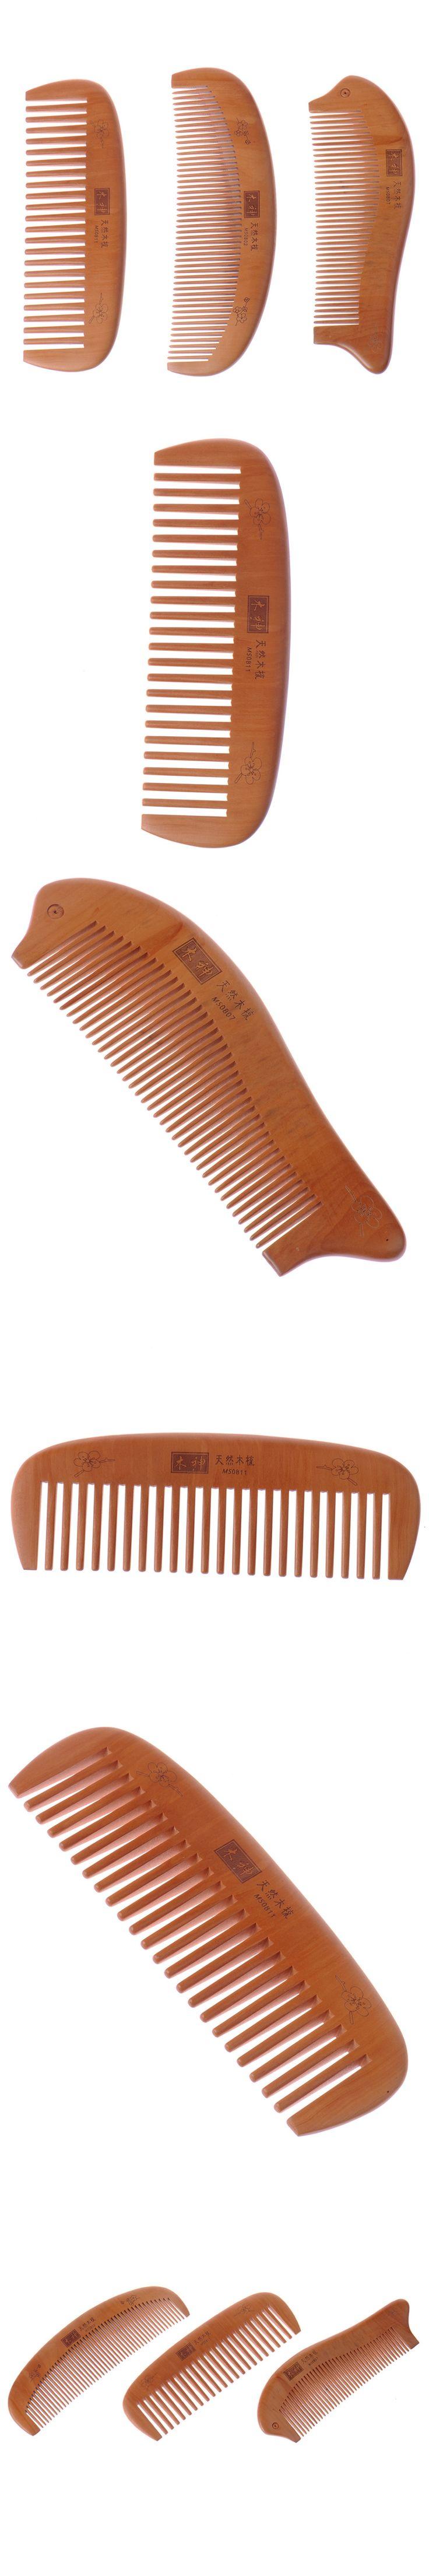 2017 Hot Peach Wooden Comb Natural Health Cushion Massage Hair brush Tangle Beard Combs hair straightener paddle brush